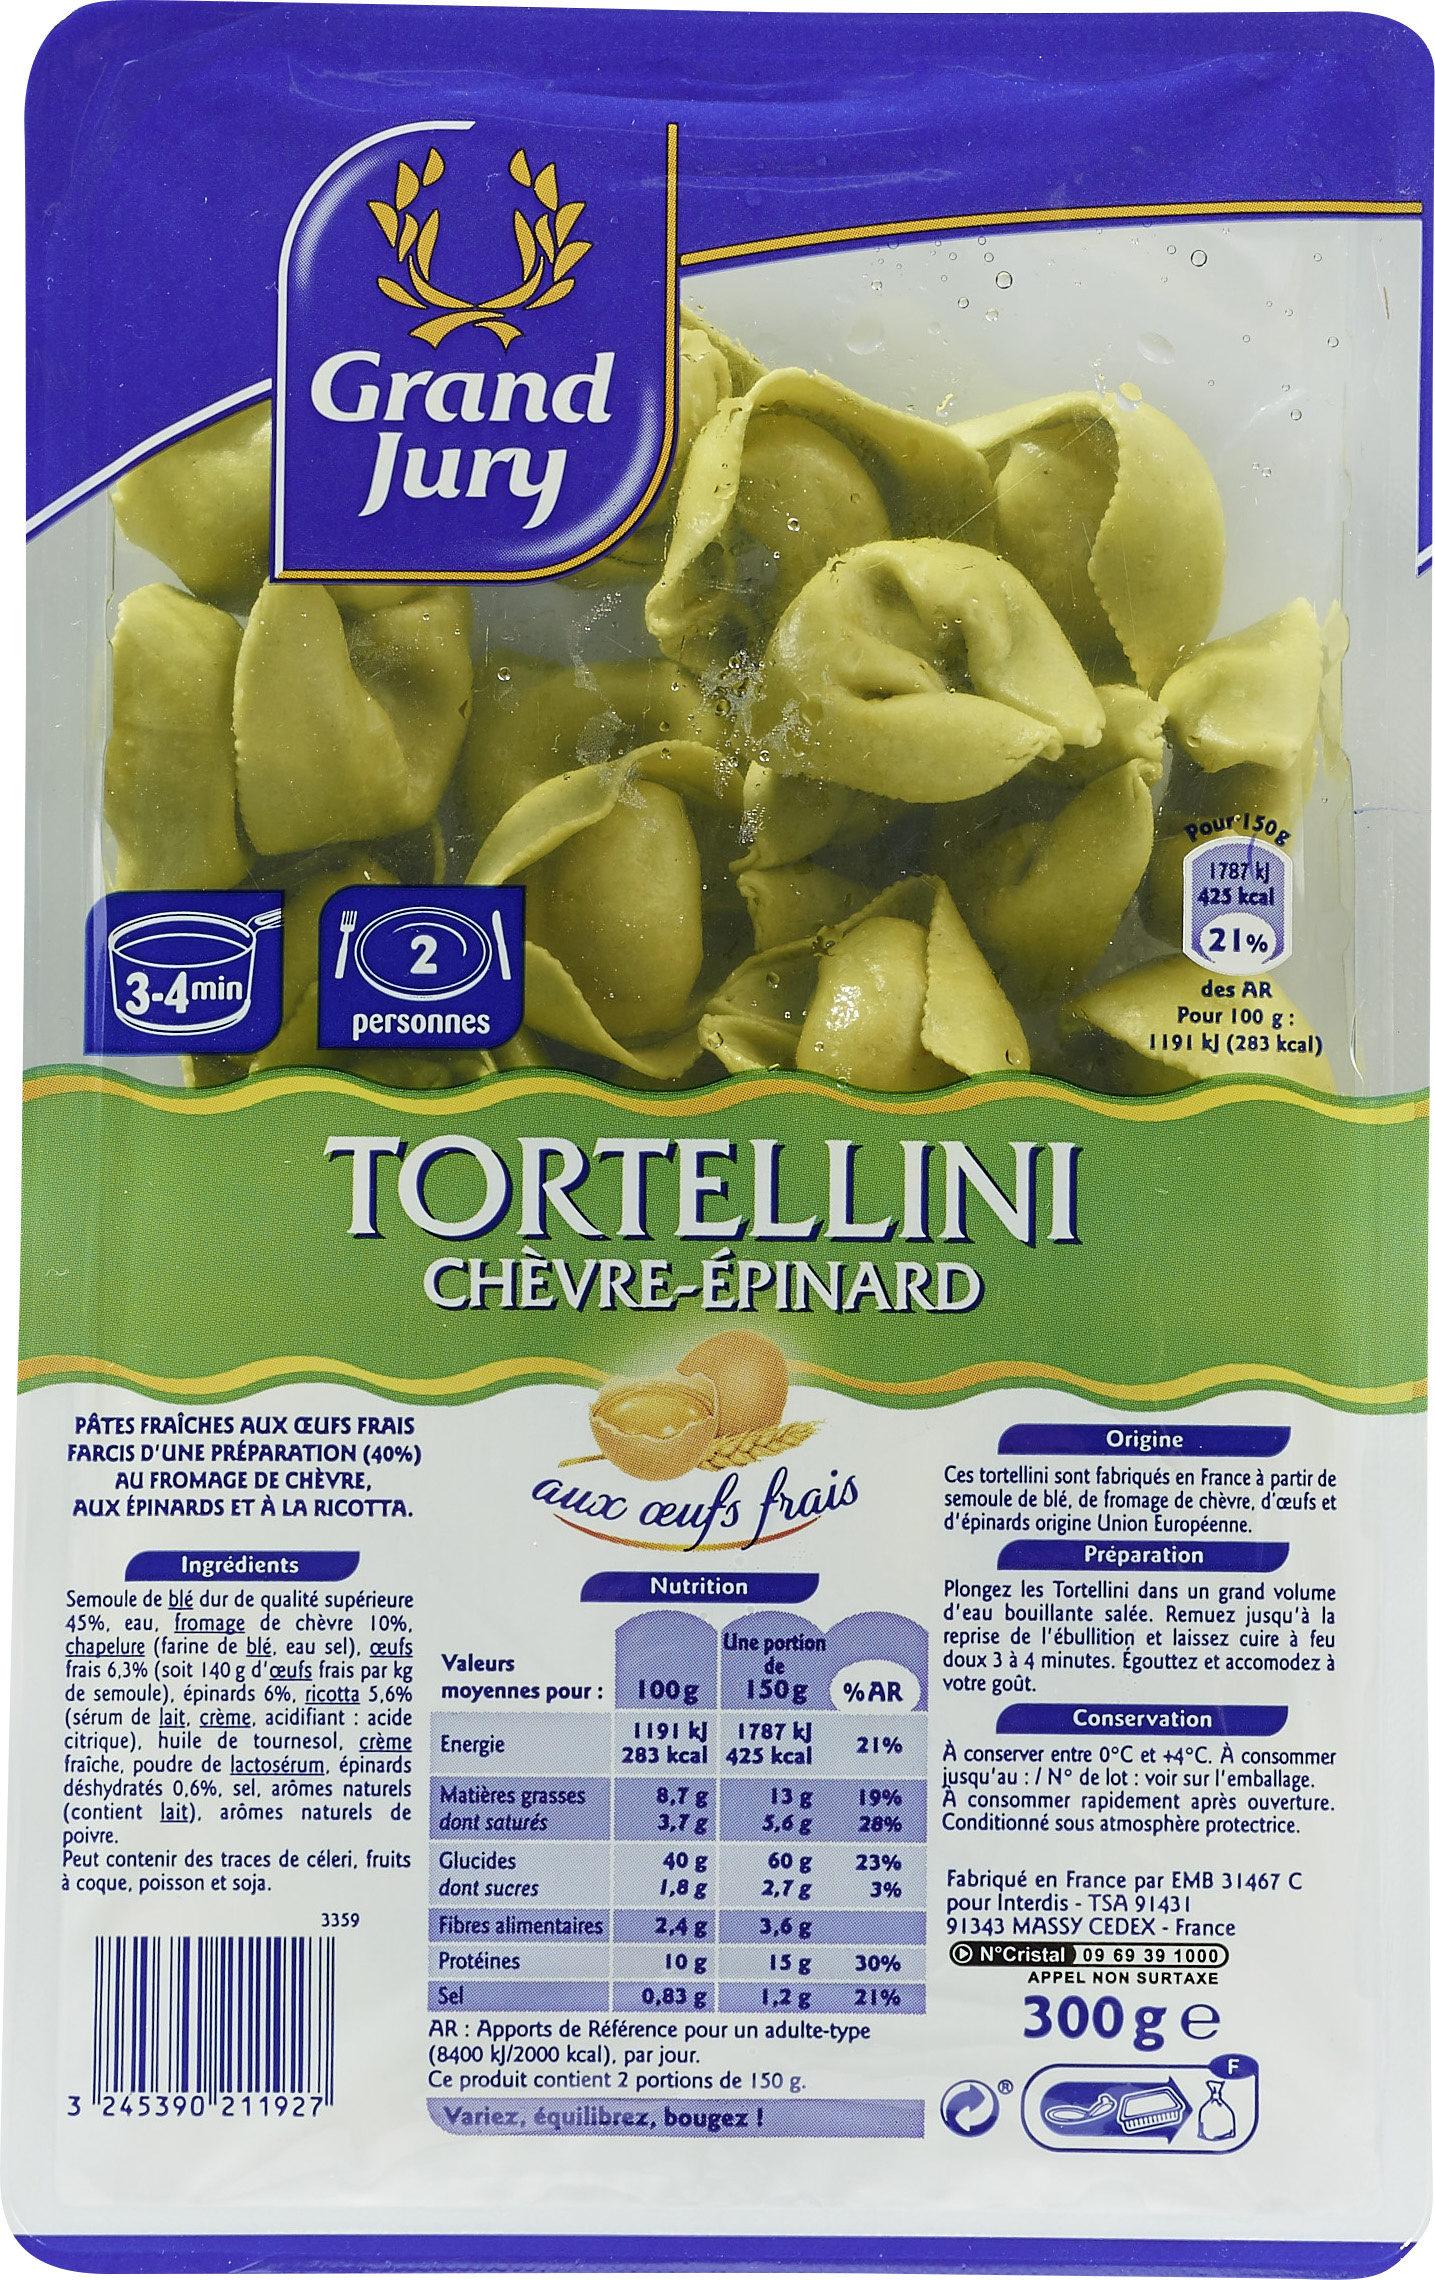 Tortellini chèvre épinards 300g grand jury - Product